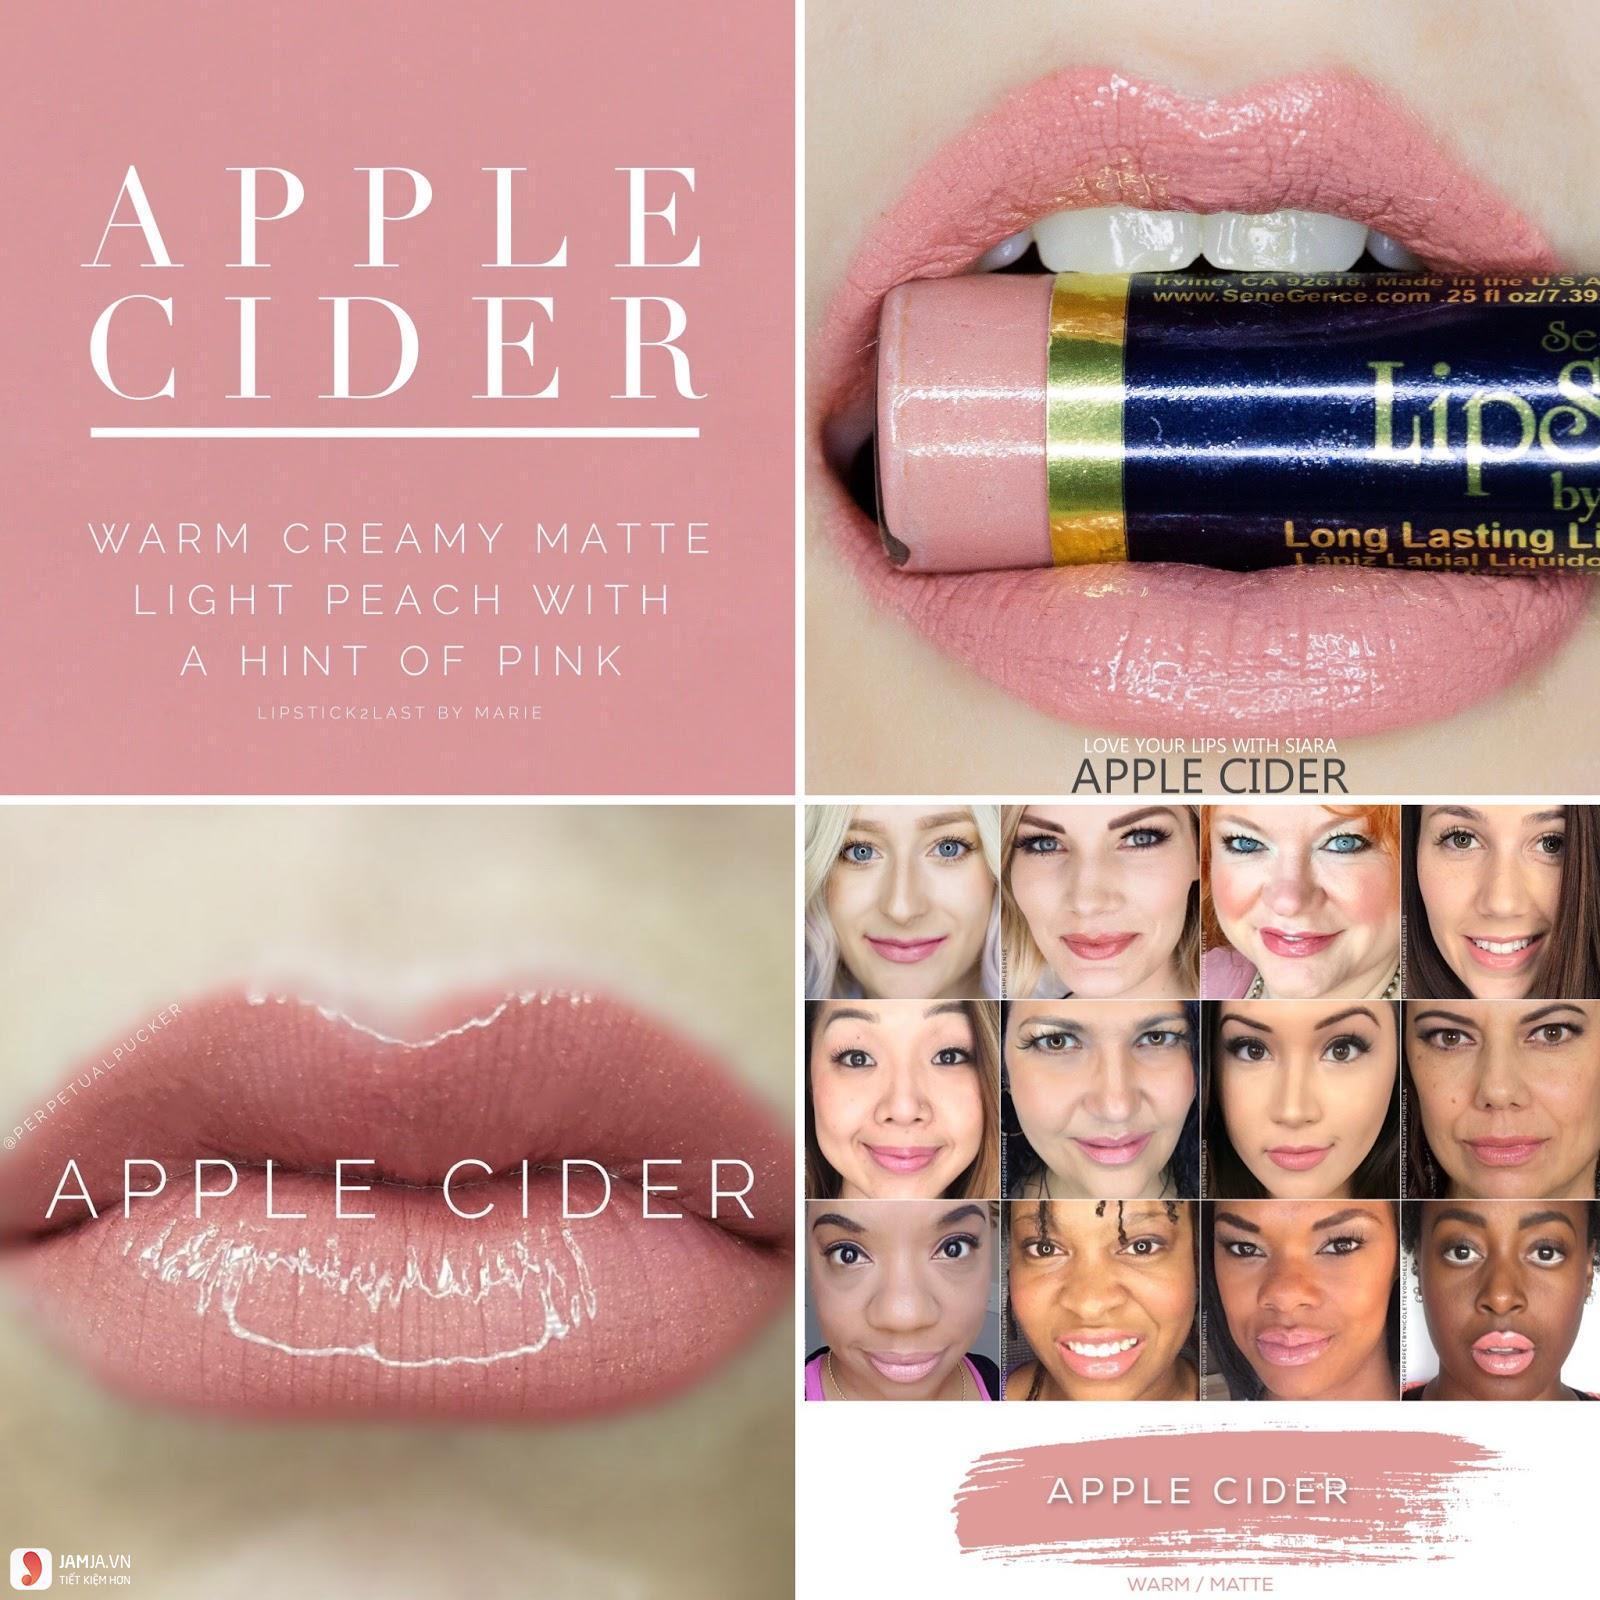 swatch son Lipsense Liquid Lip Color Mattemàu Apple Cider